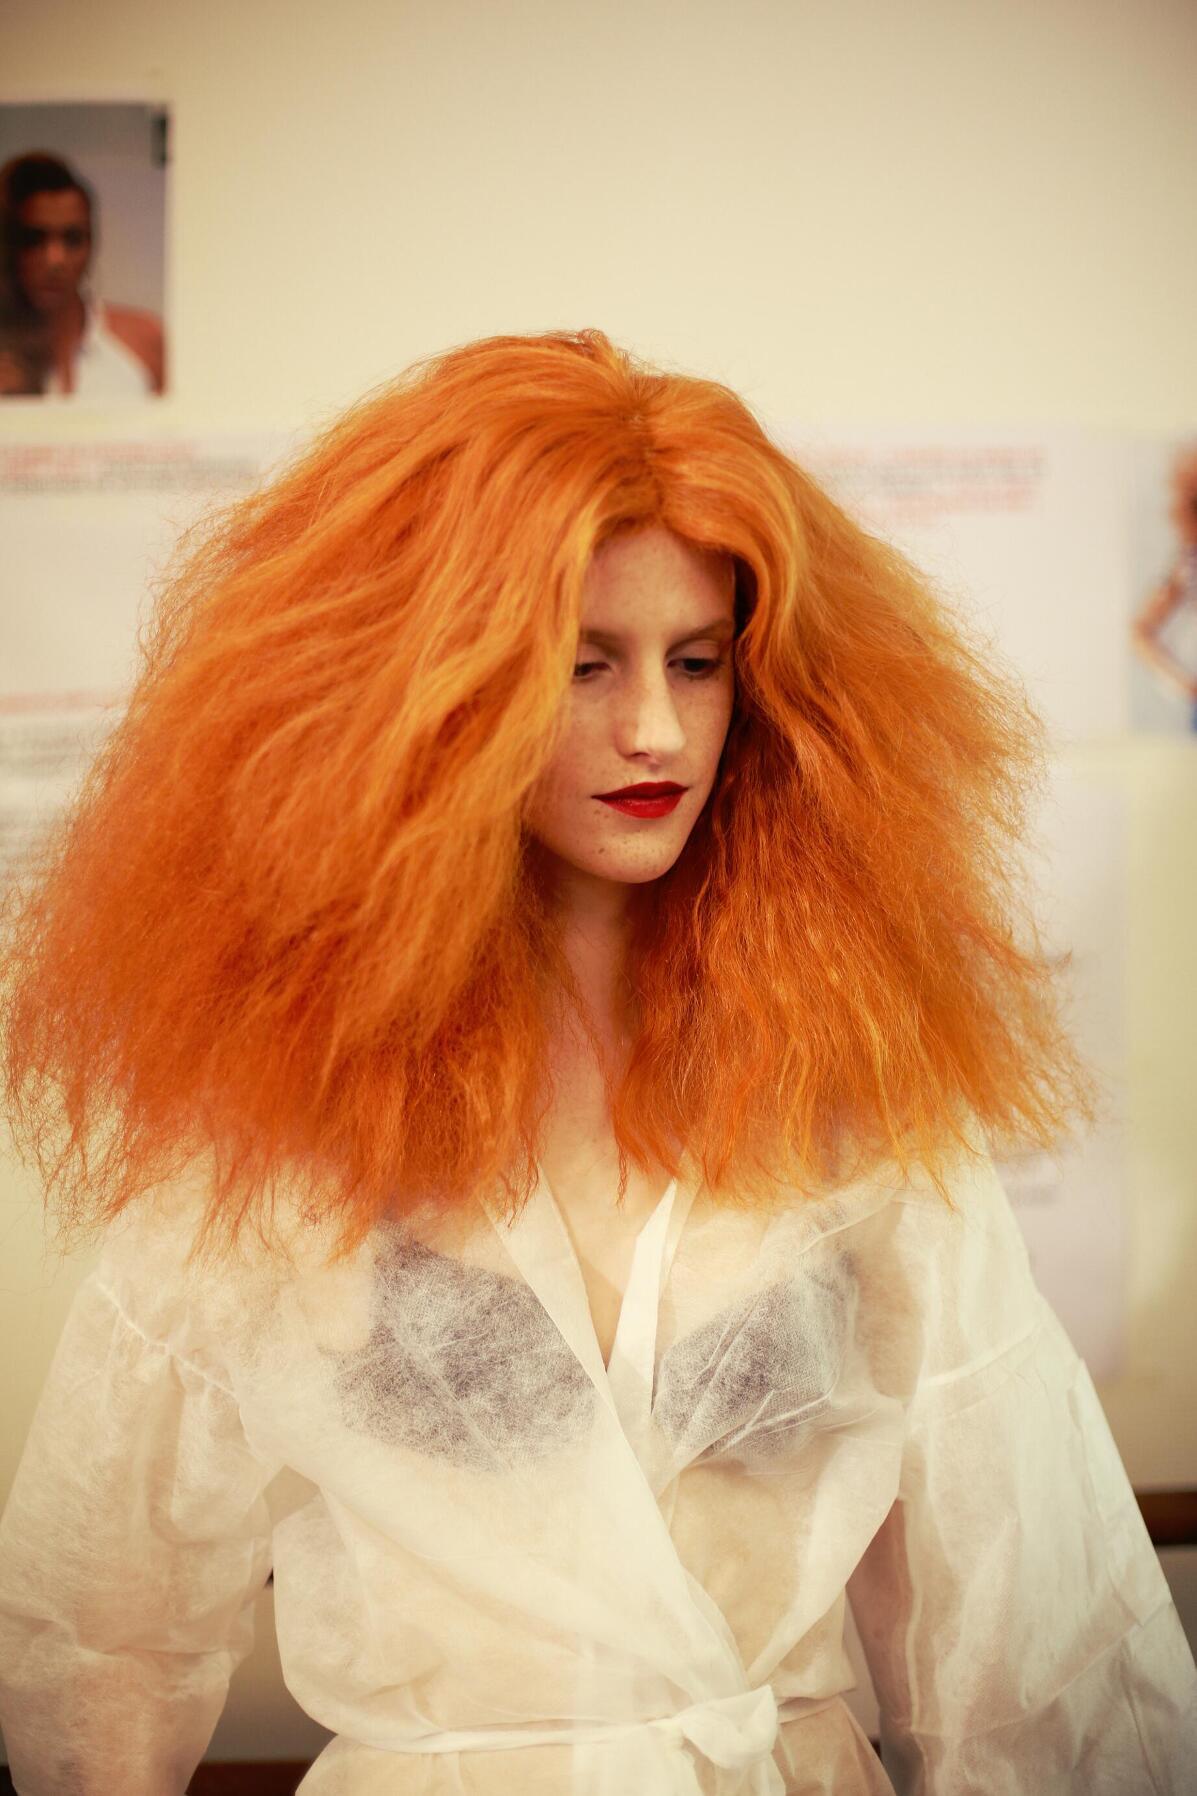 Jean Paul Gaultier Backstage Hair Style